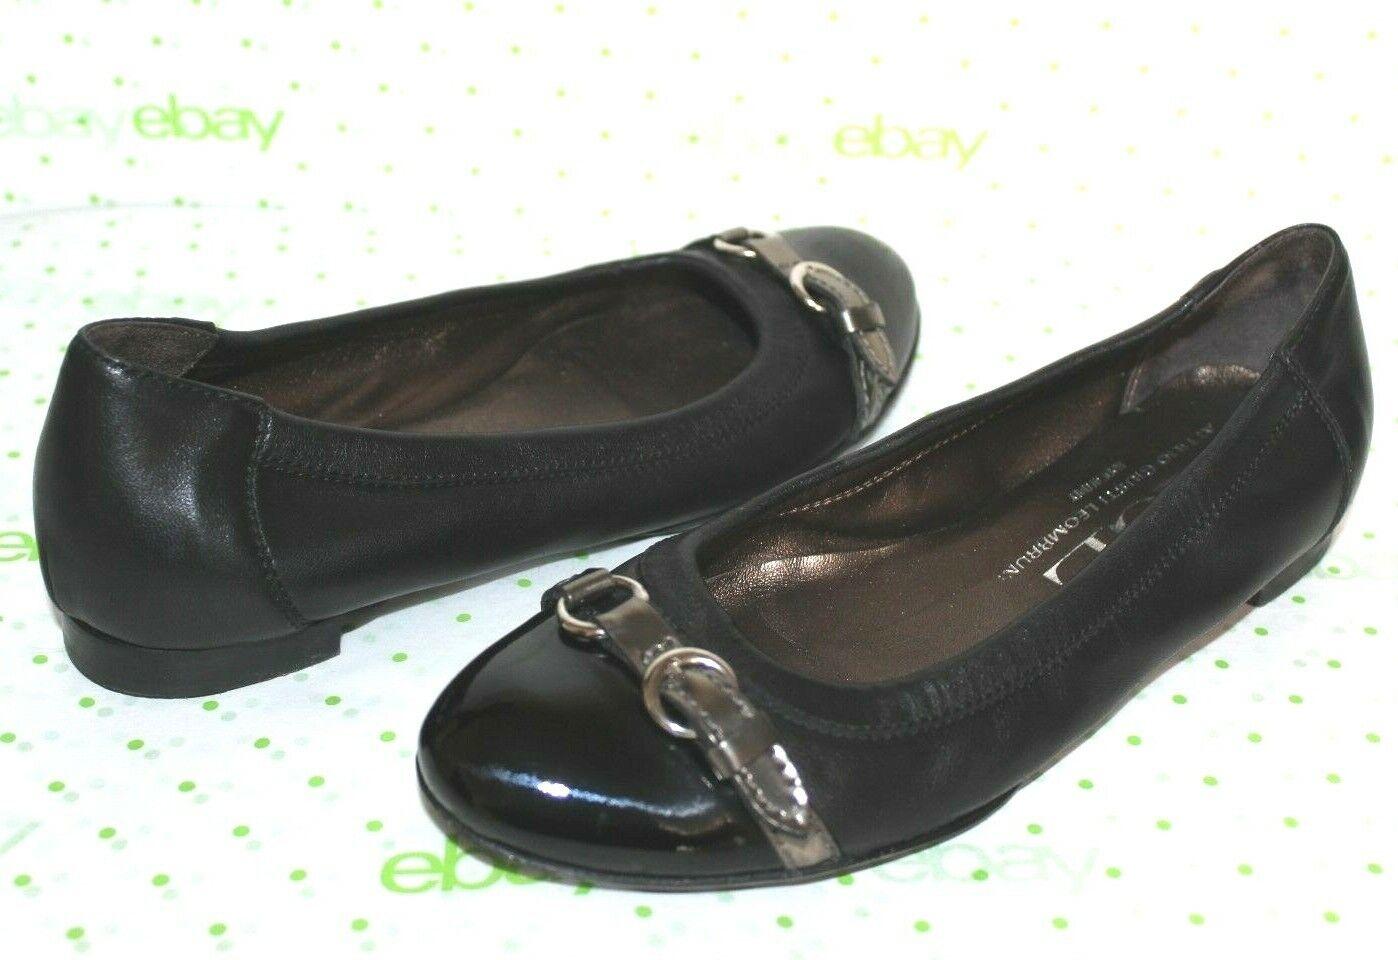 AGL Attilio Giusti Leombruni Cap-Toe Leather Flats 5.5 35.5  GREAT L@@K 06